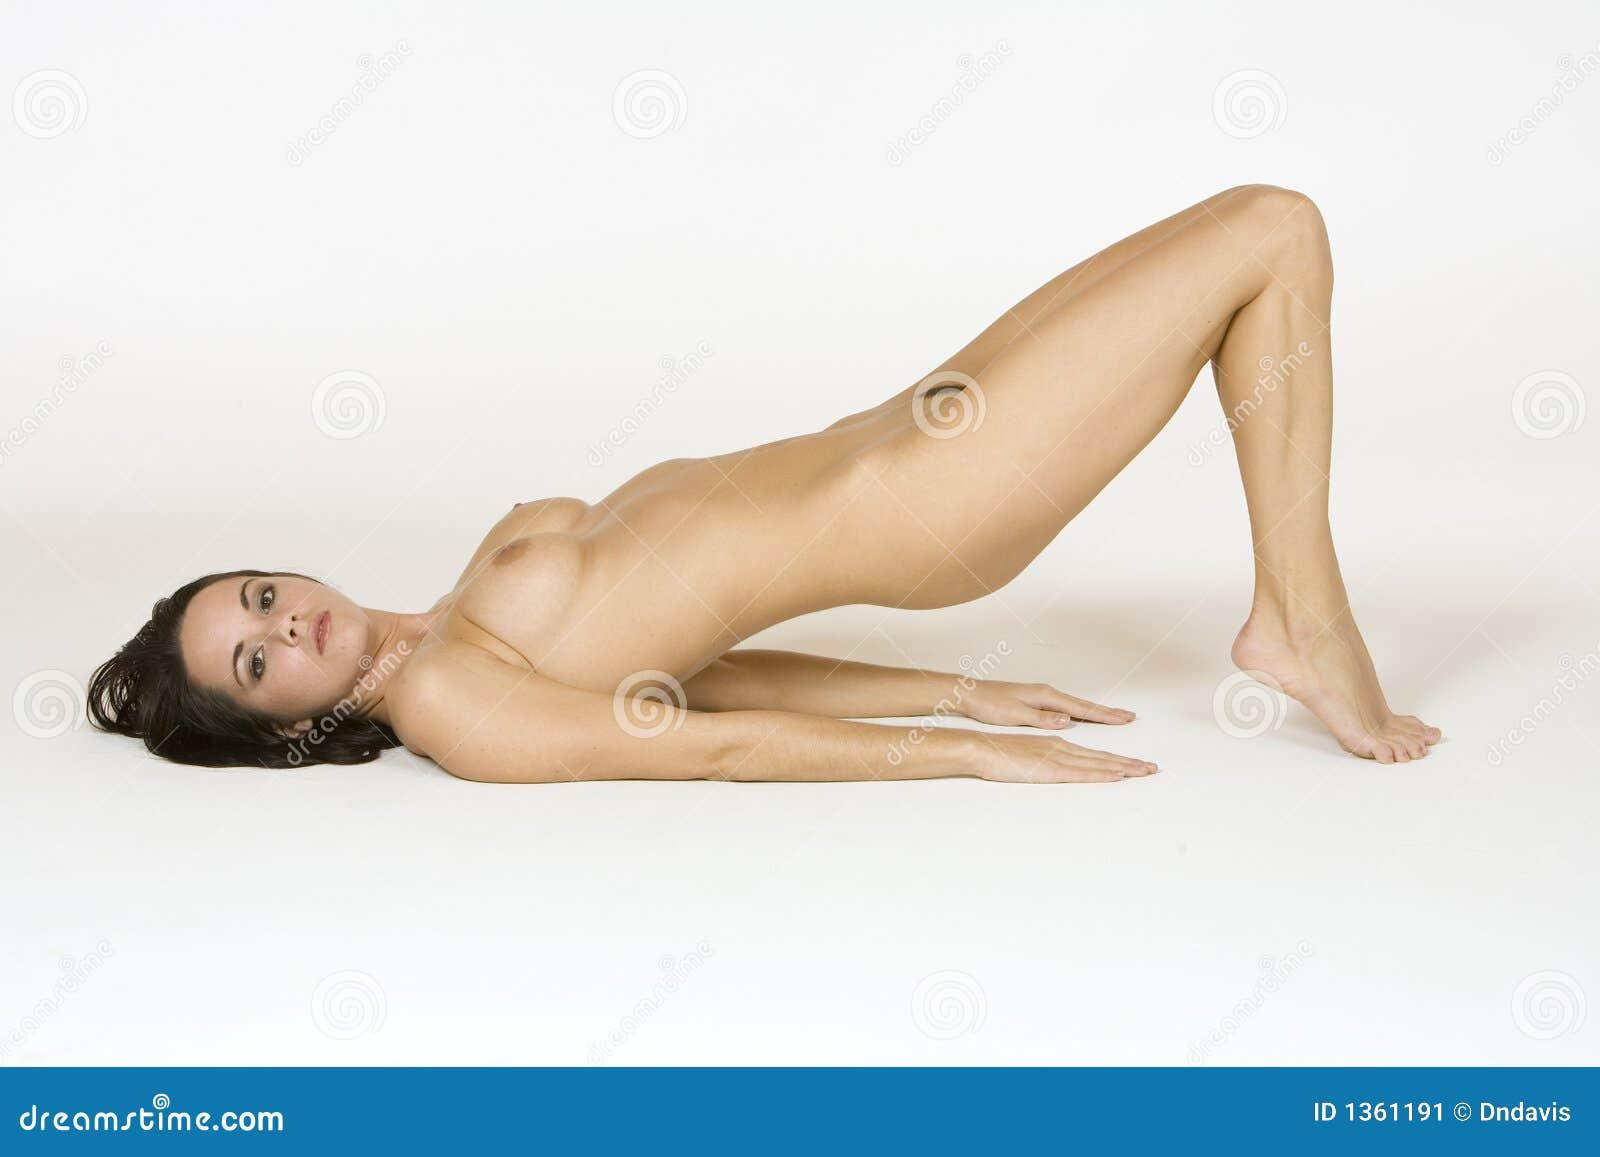 Sexy women posing nude